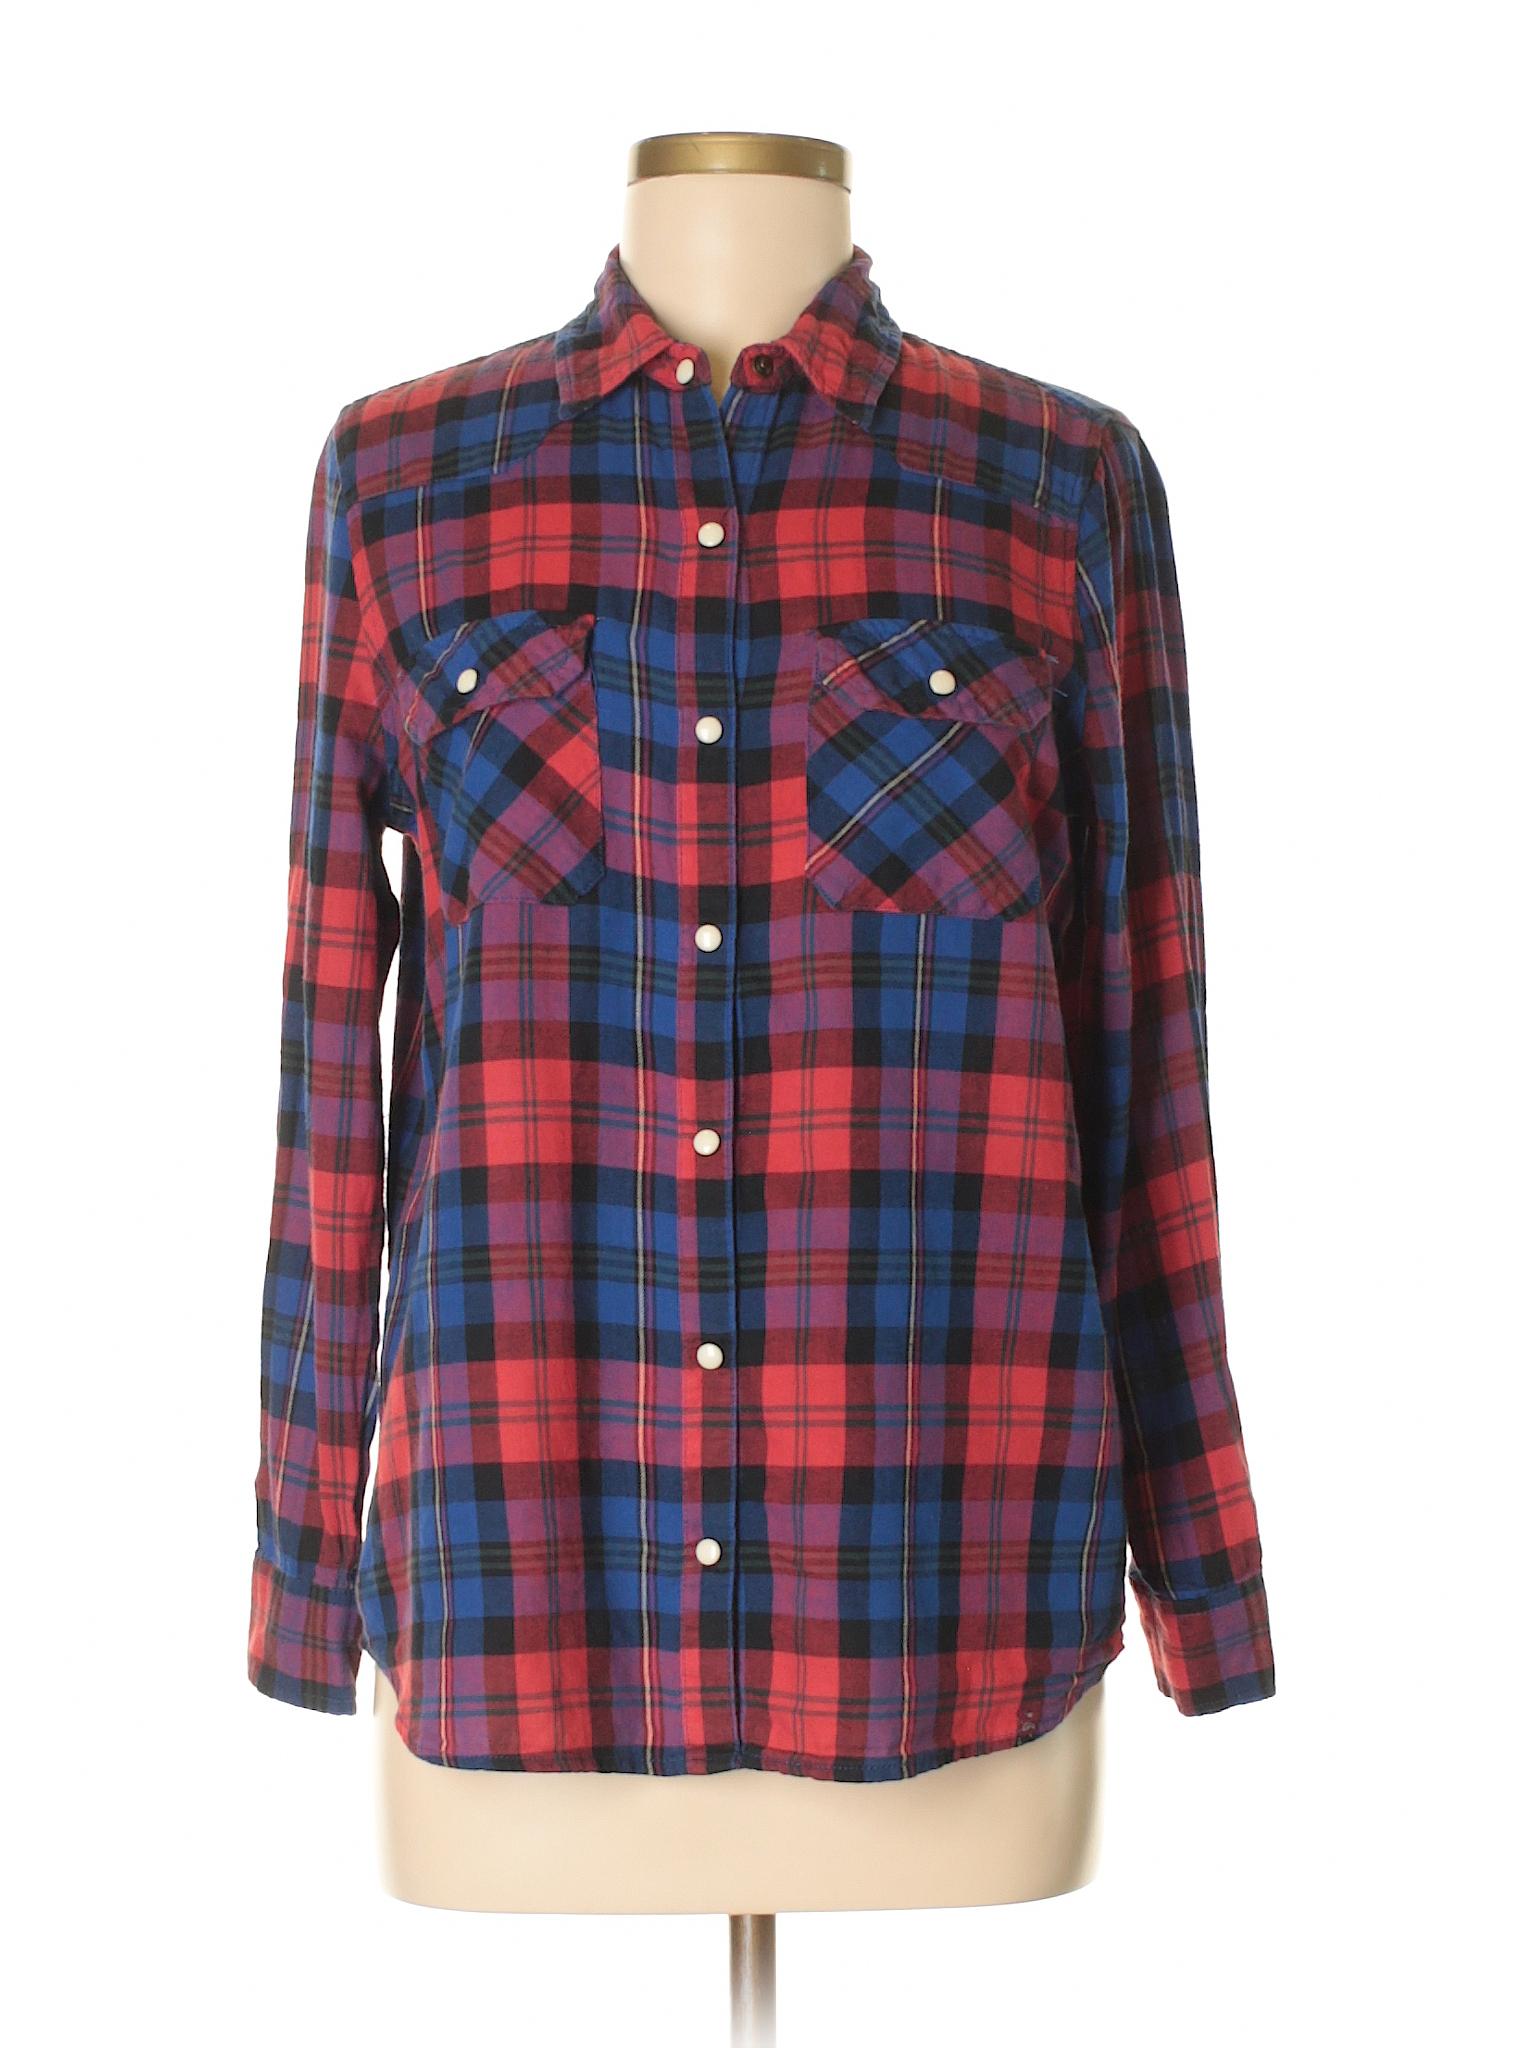 1d6c94c89b2 Forever 21 Long Sleeve Button Down Shirt  Size 4.00 Dark Blue Women s Tops  -  8.99